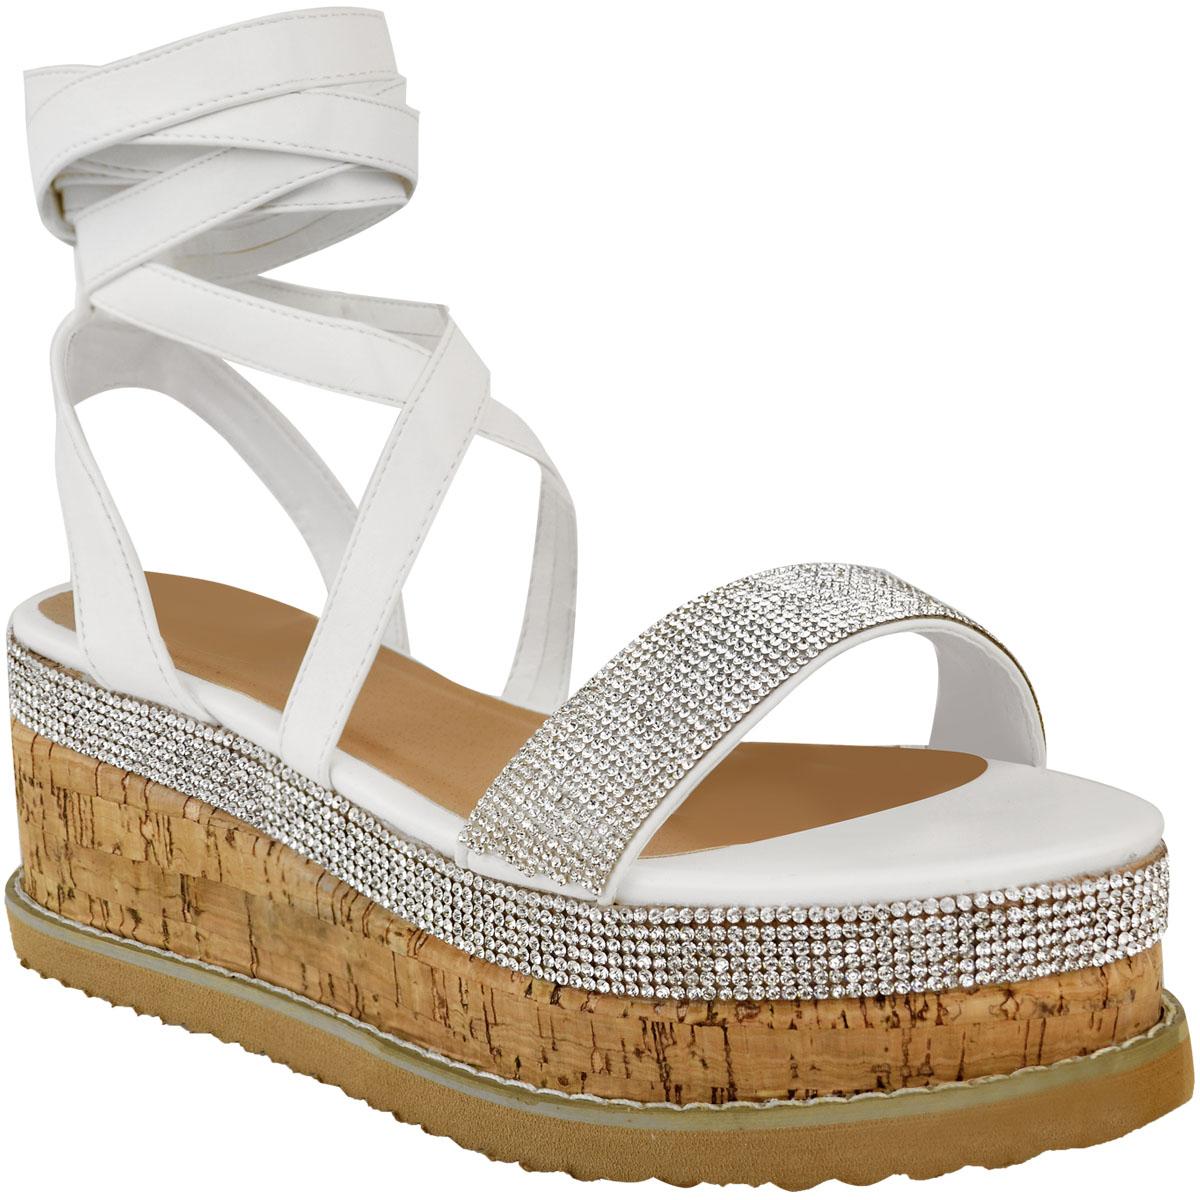 Womens-Ladies-Flatform-Diamante-Wedge-Sandals-Platform-Ankle-Lace-Up-Summer-Size thumbnail 13